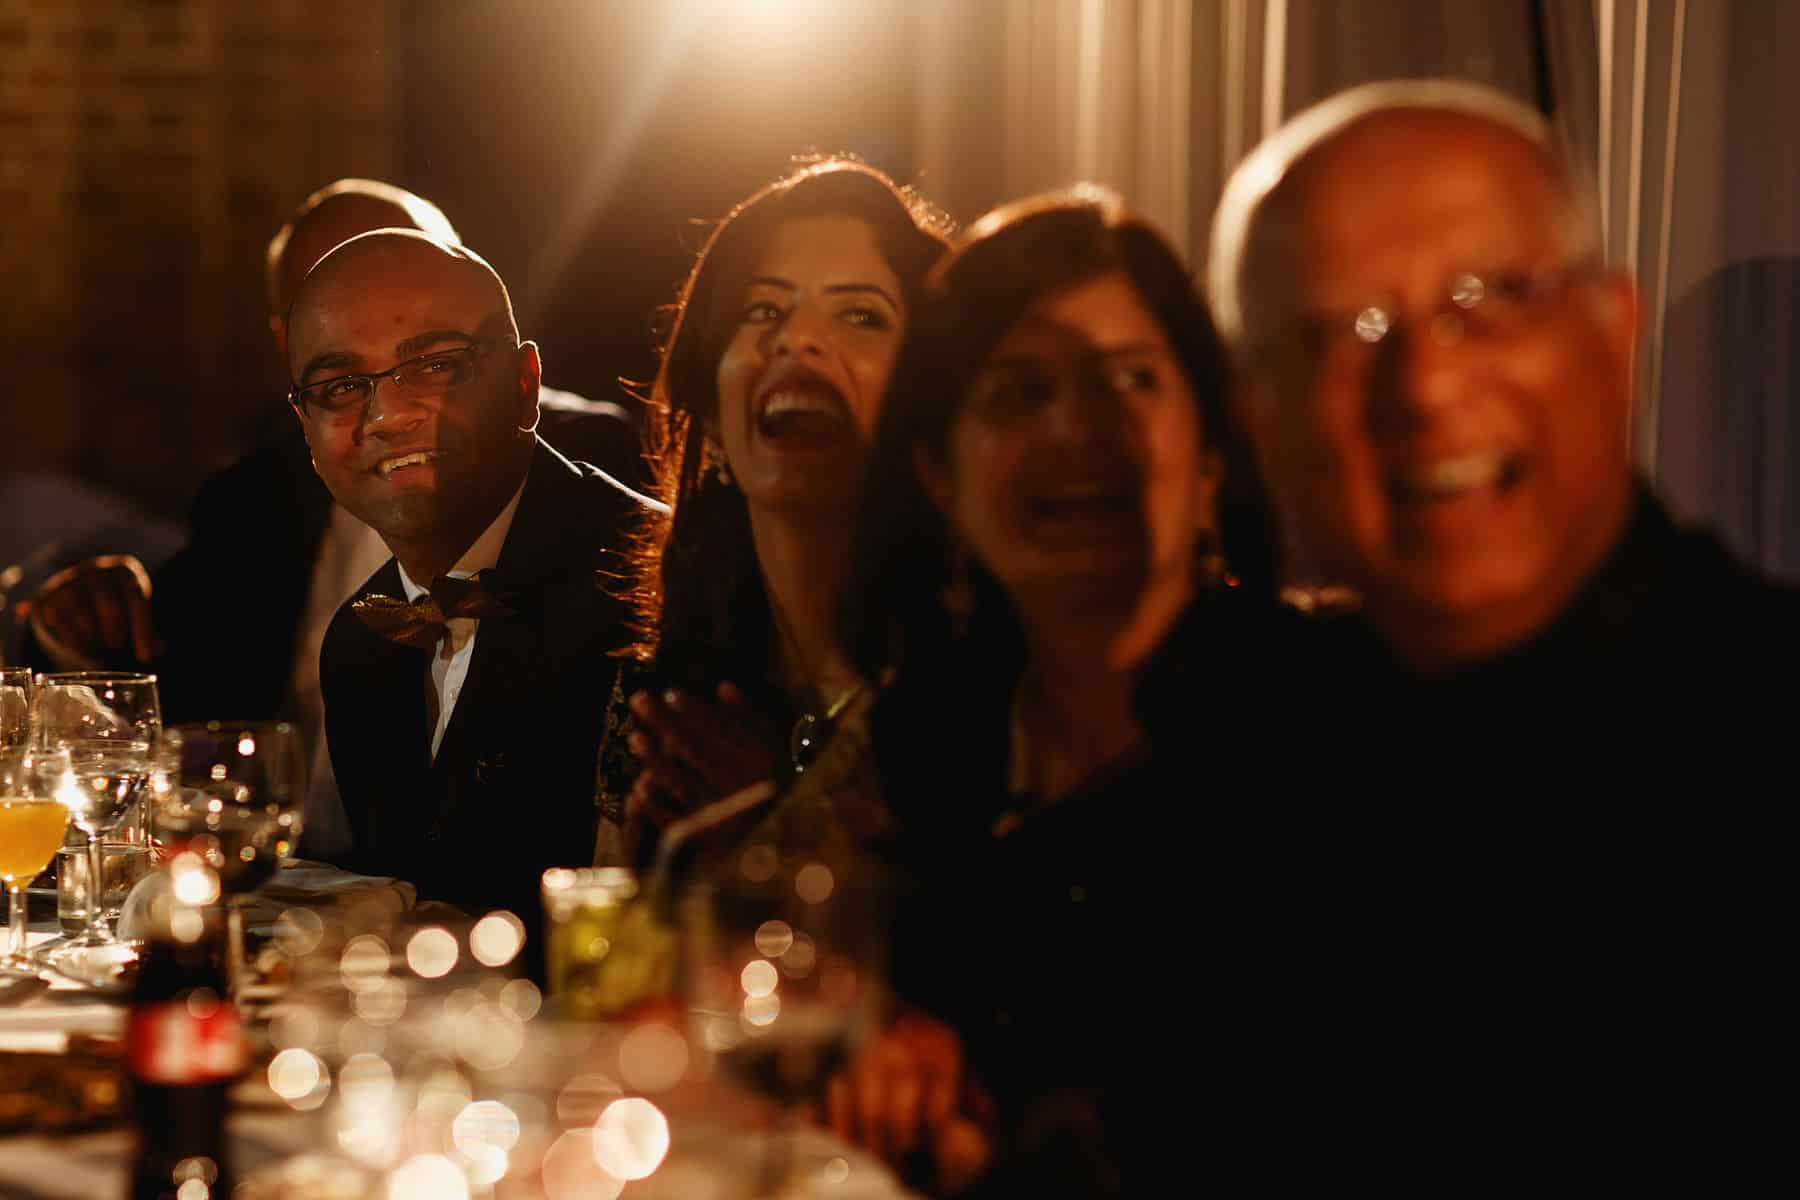 kelham hall wedding photographewr